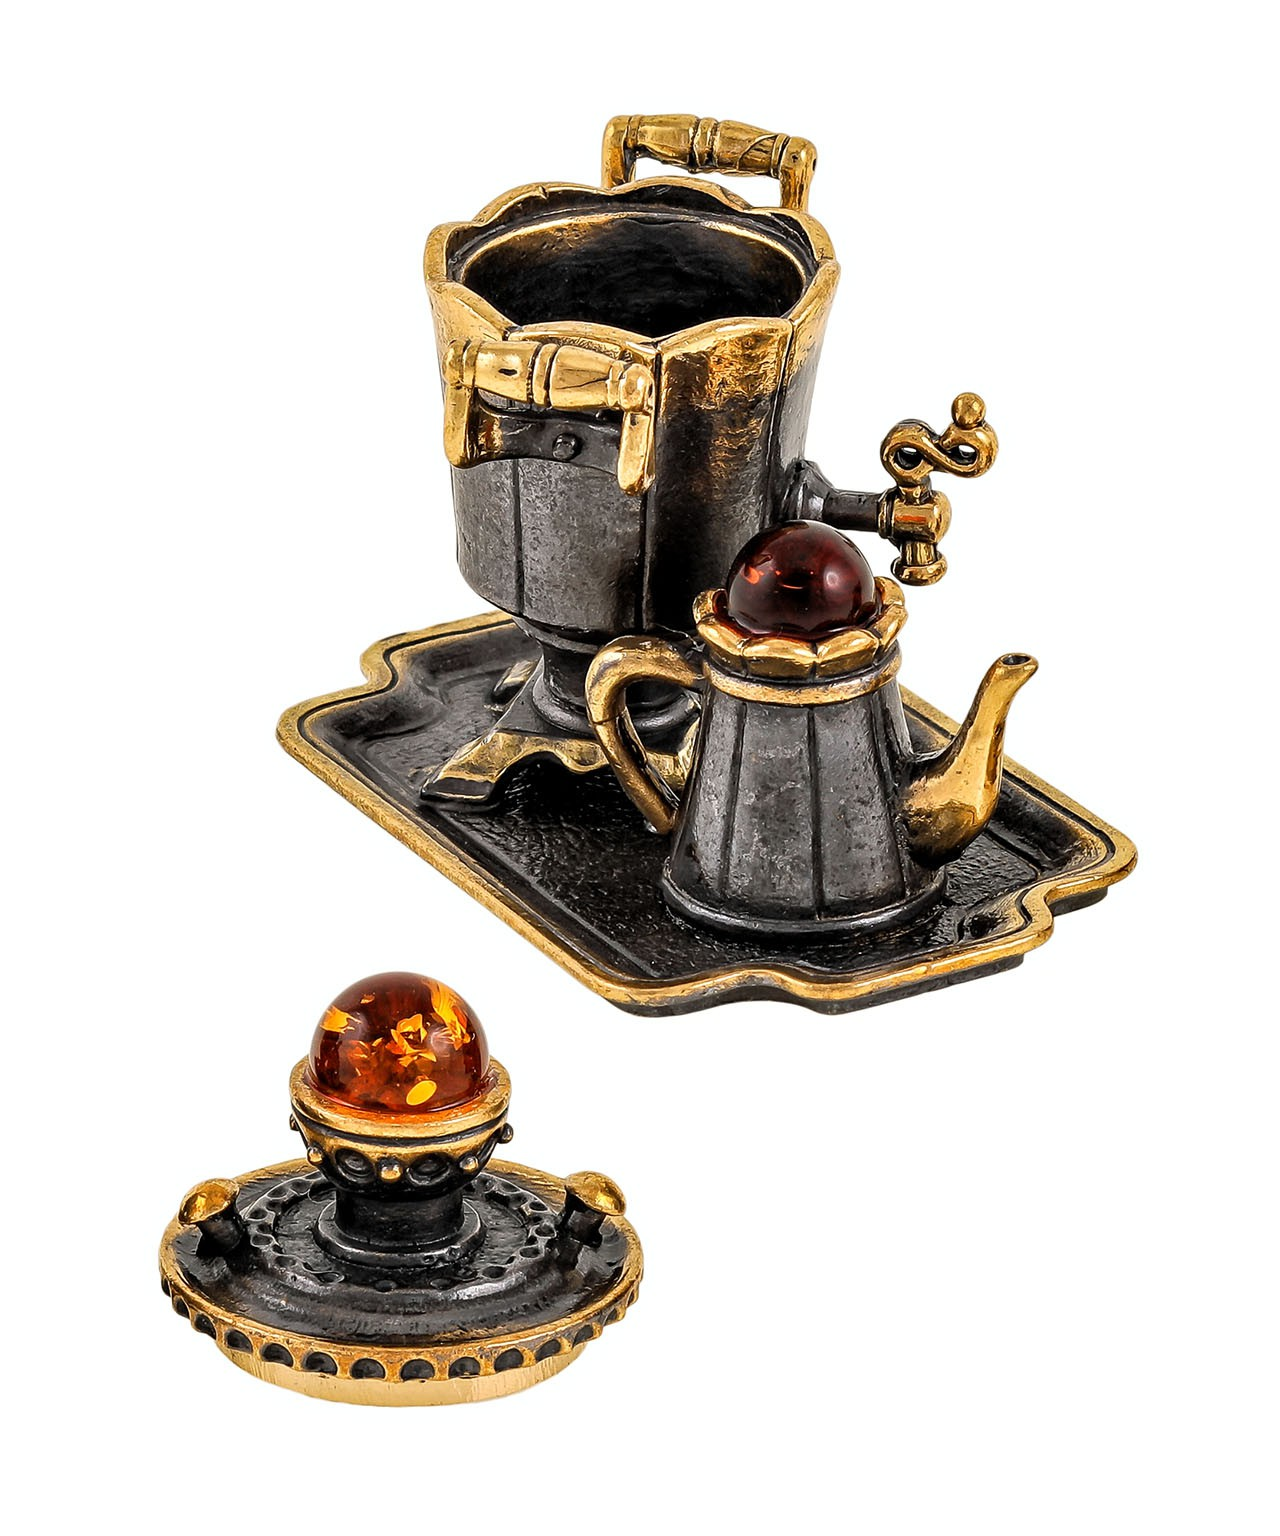 Самовар Чайный сервиз 1891